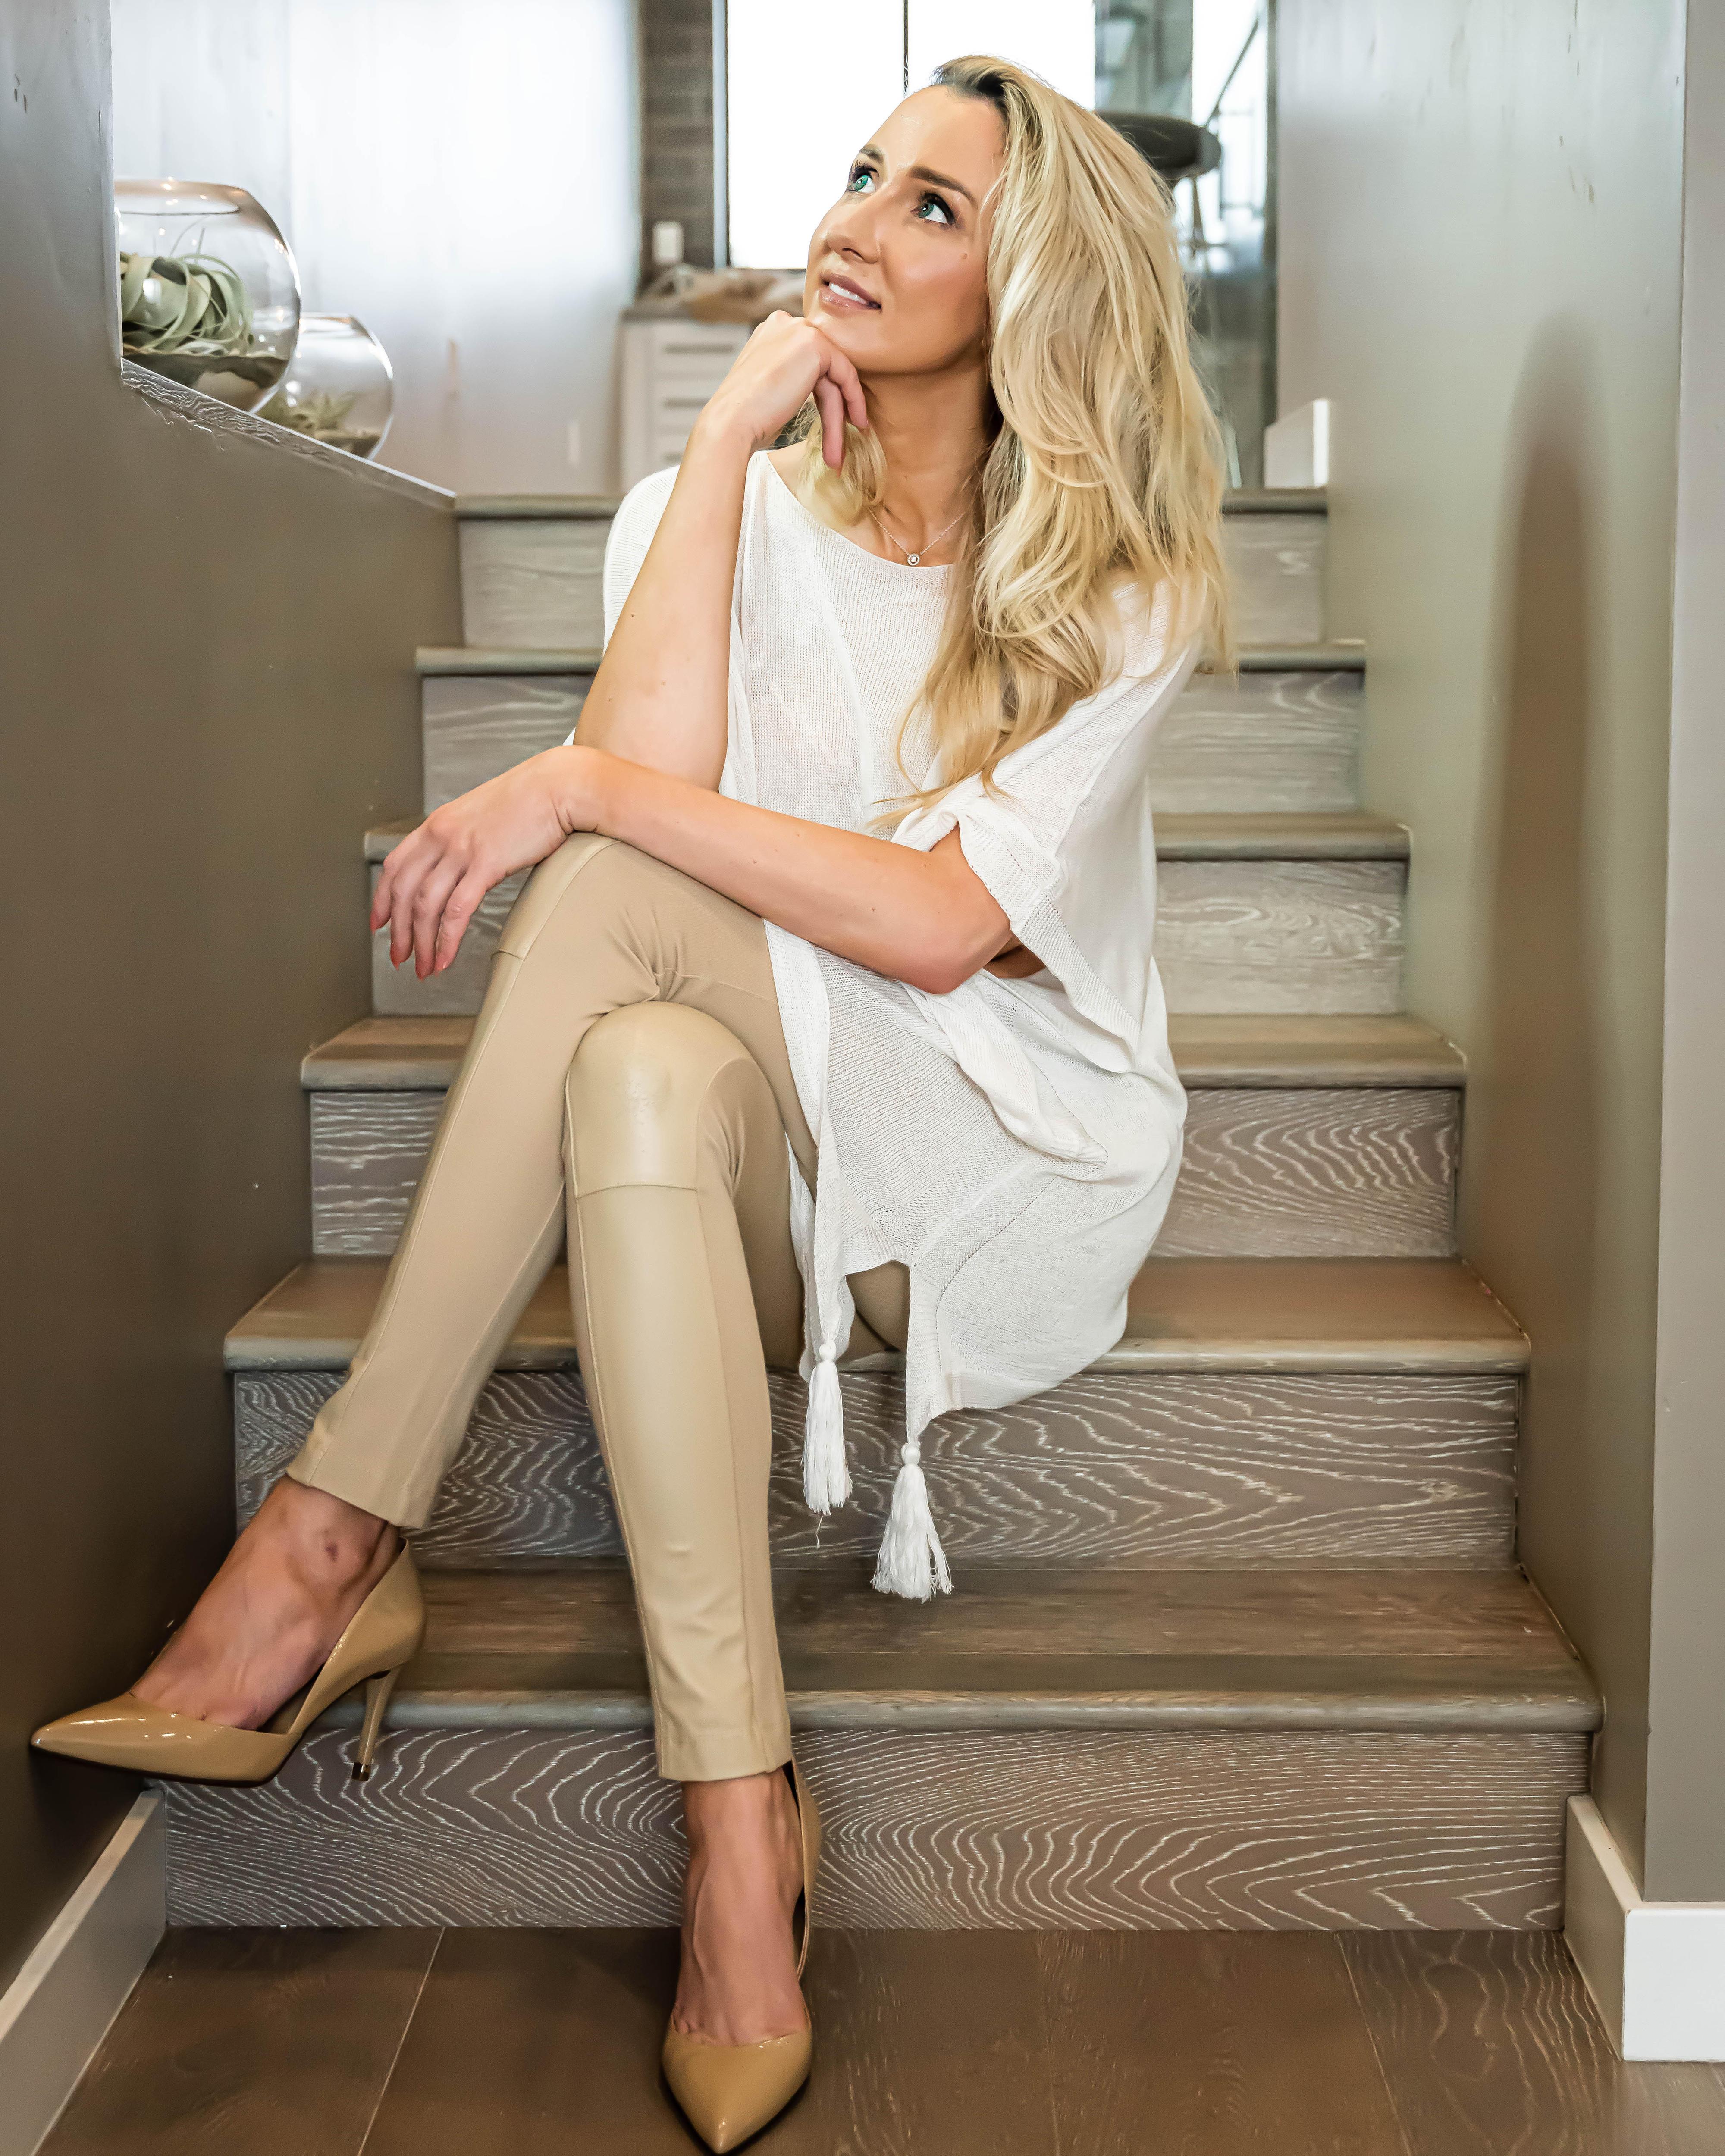 Julia sitting on stairs